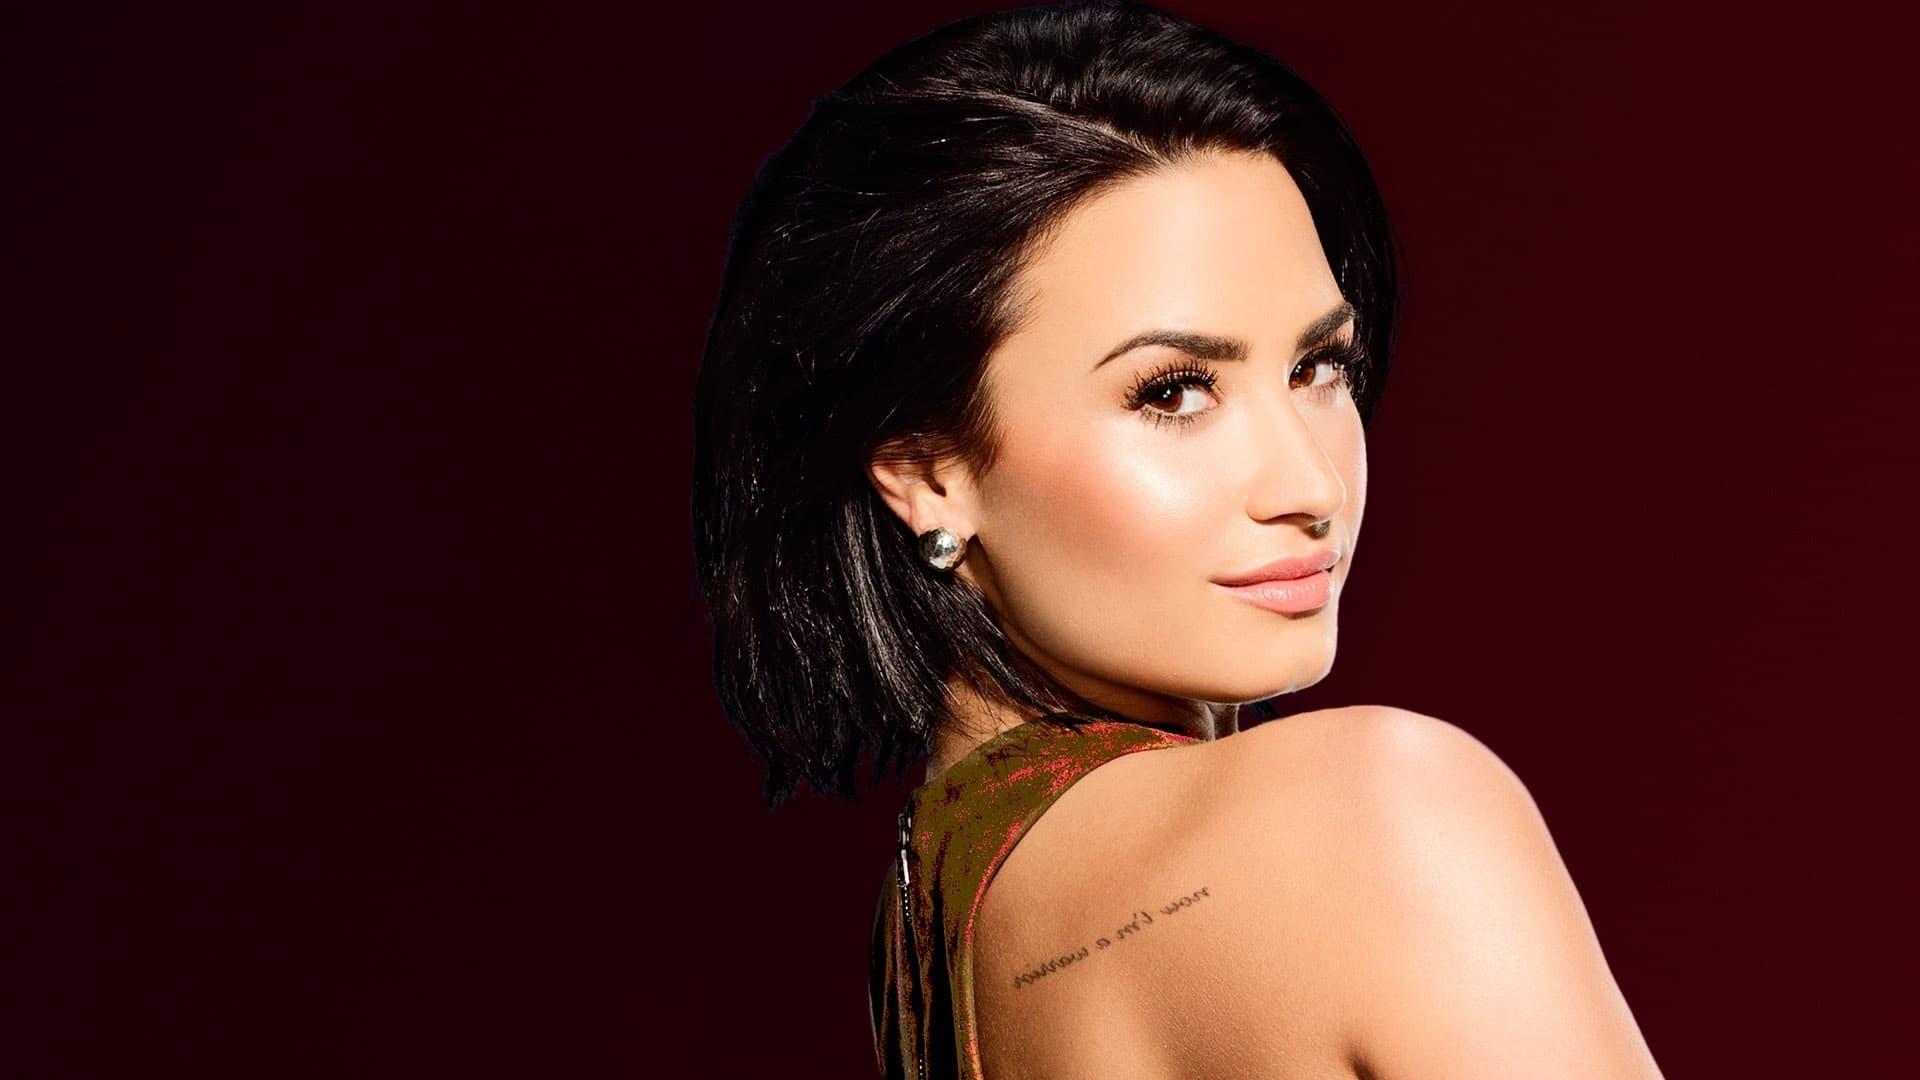 Demi Lovato Background (68+ Images